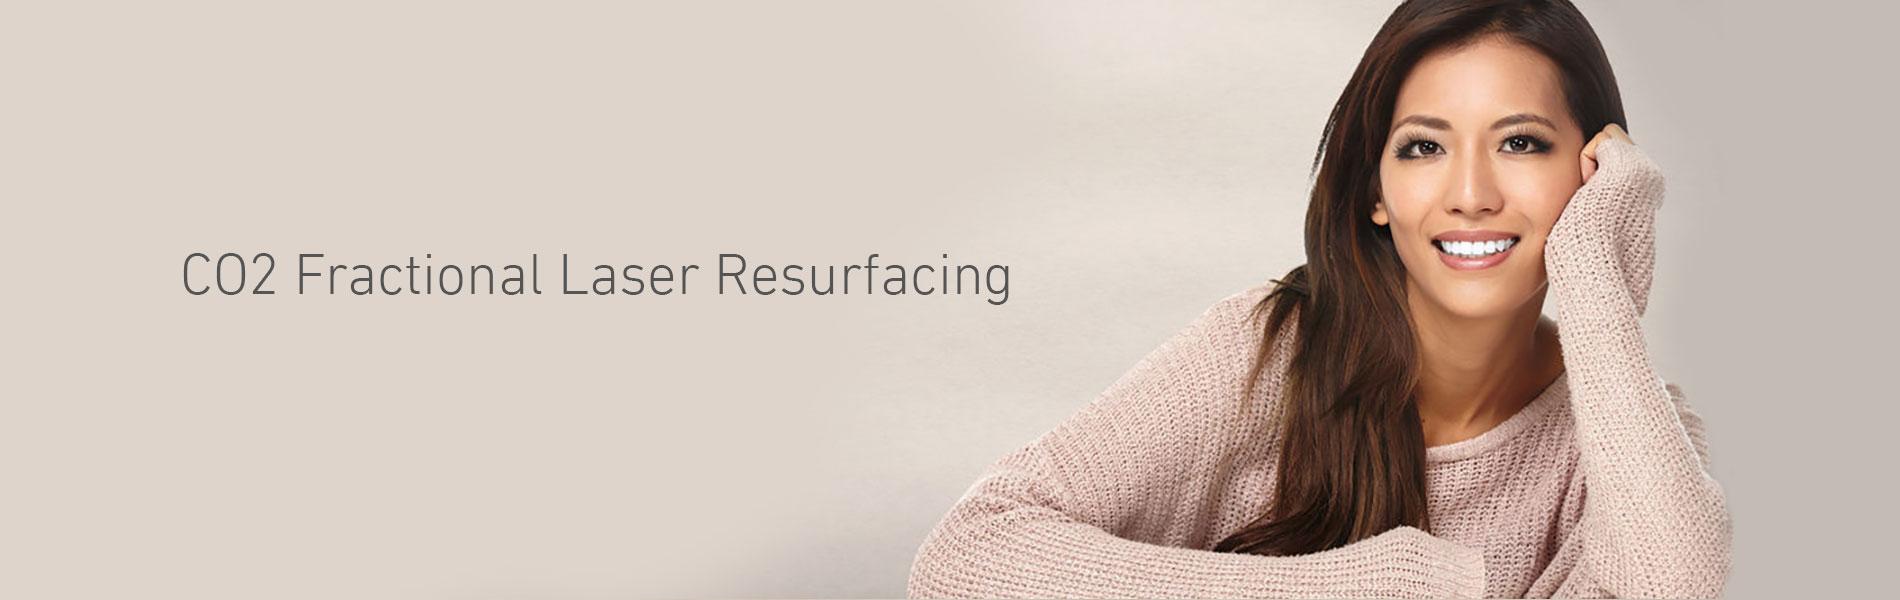 CO2 Fractional Laser Skin Resurfacing Southampton Hampshire Aesthetics Clinic